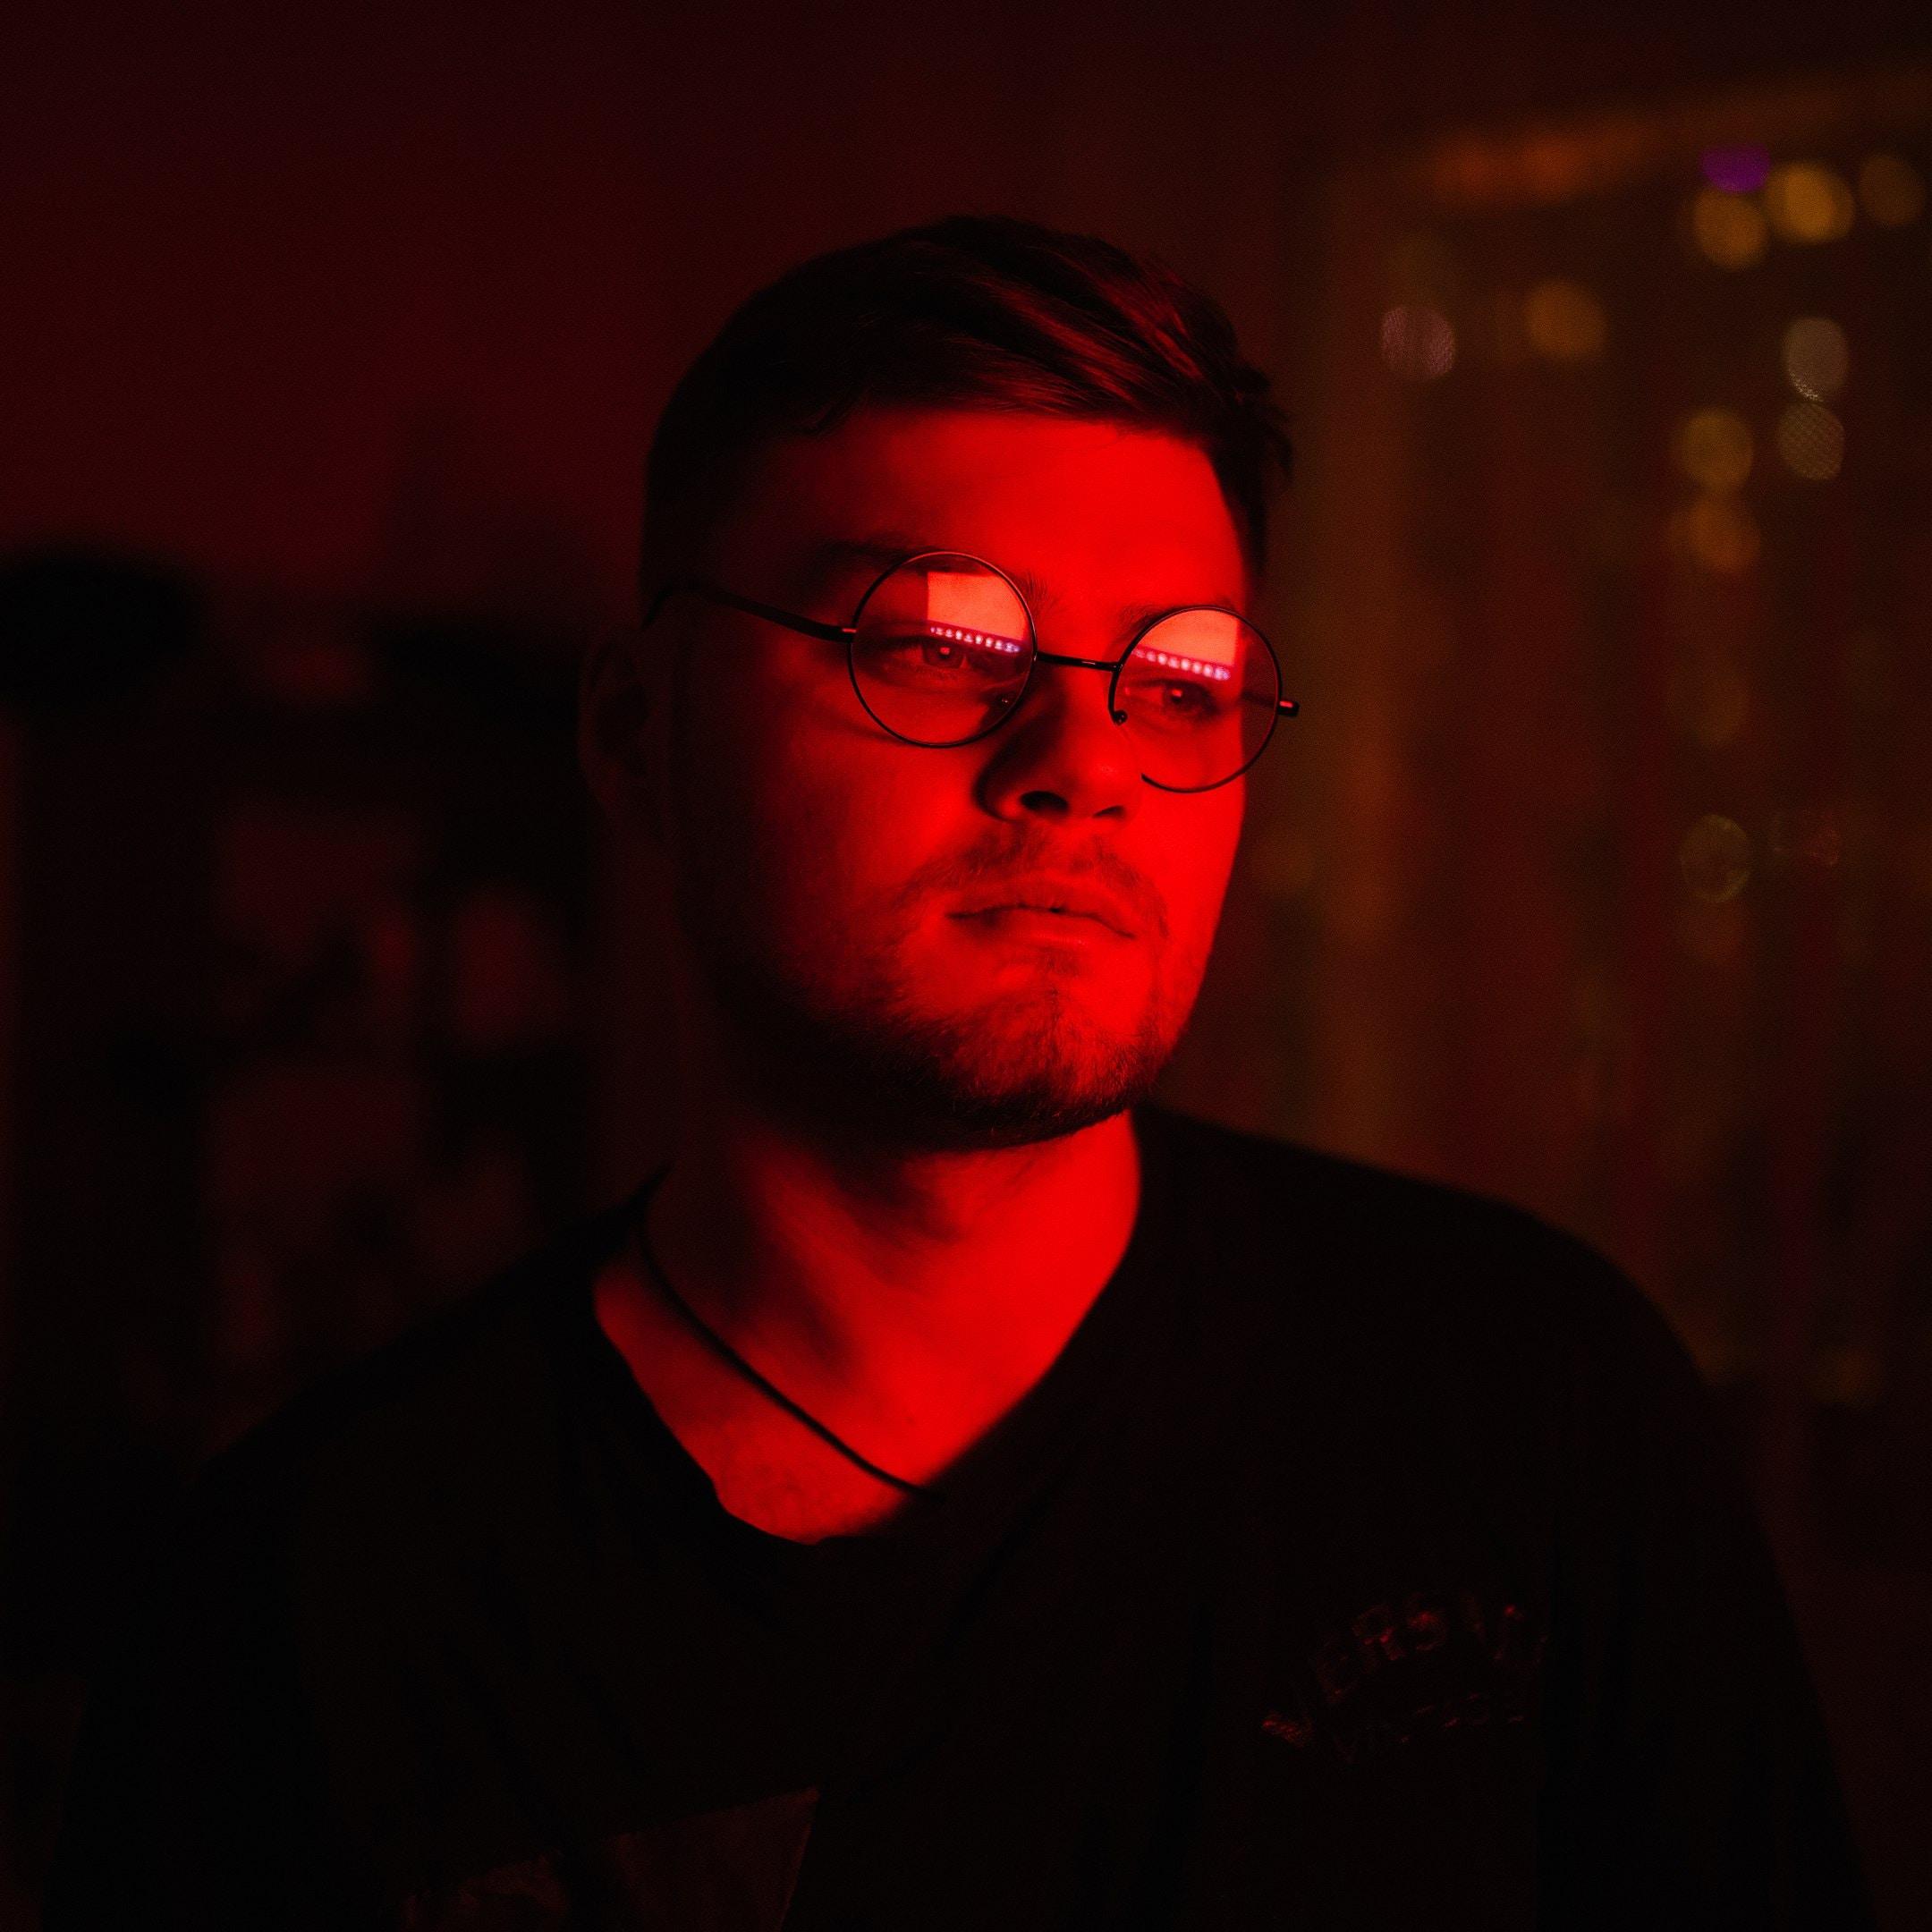 Go to Daniil Lobachev's profile